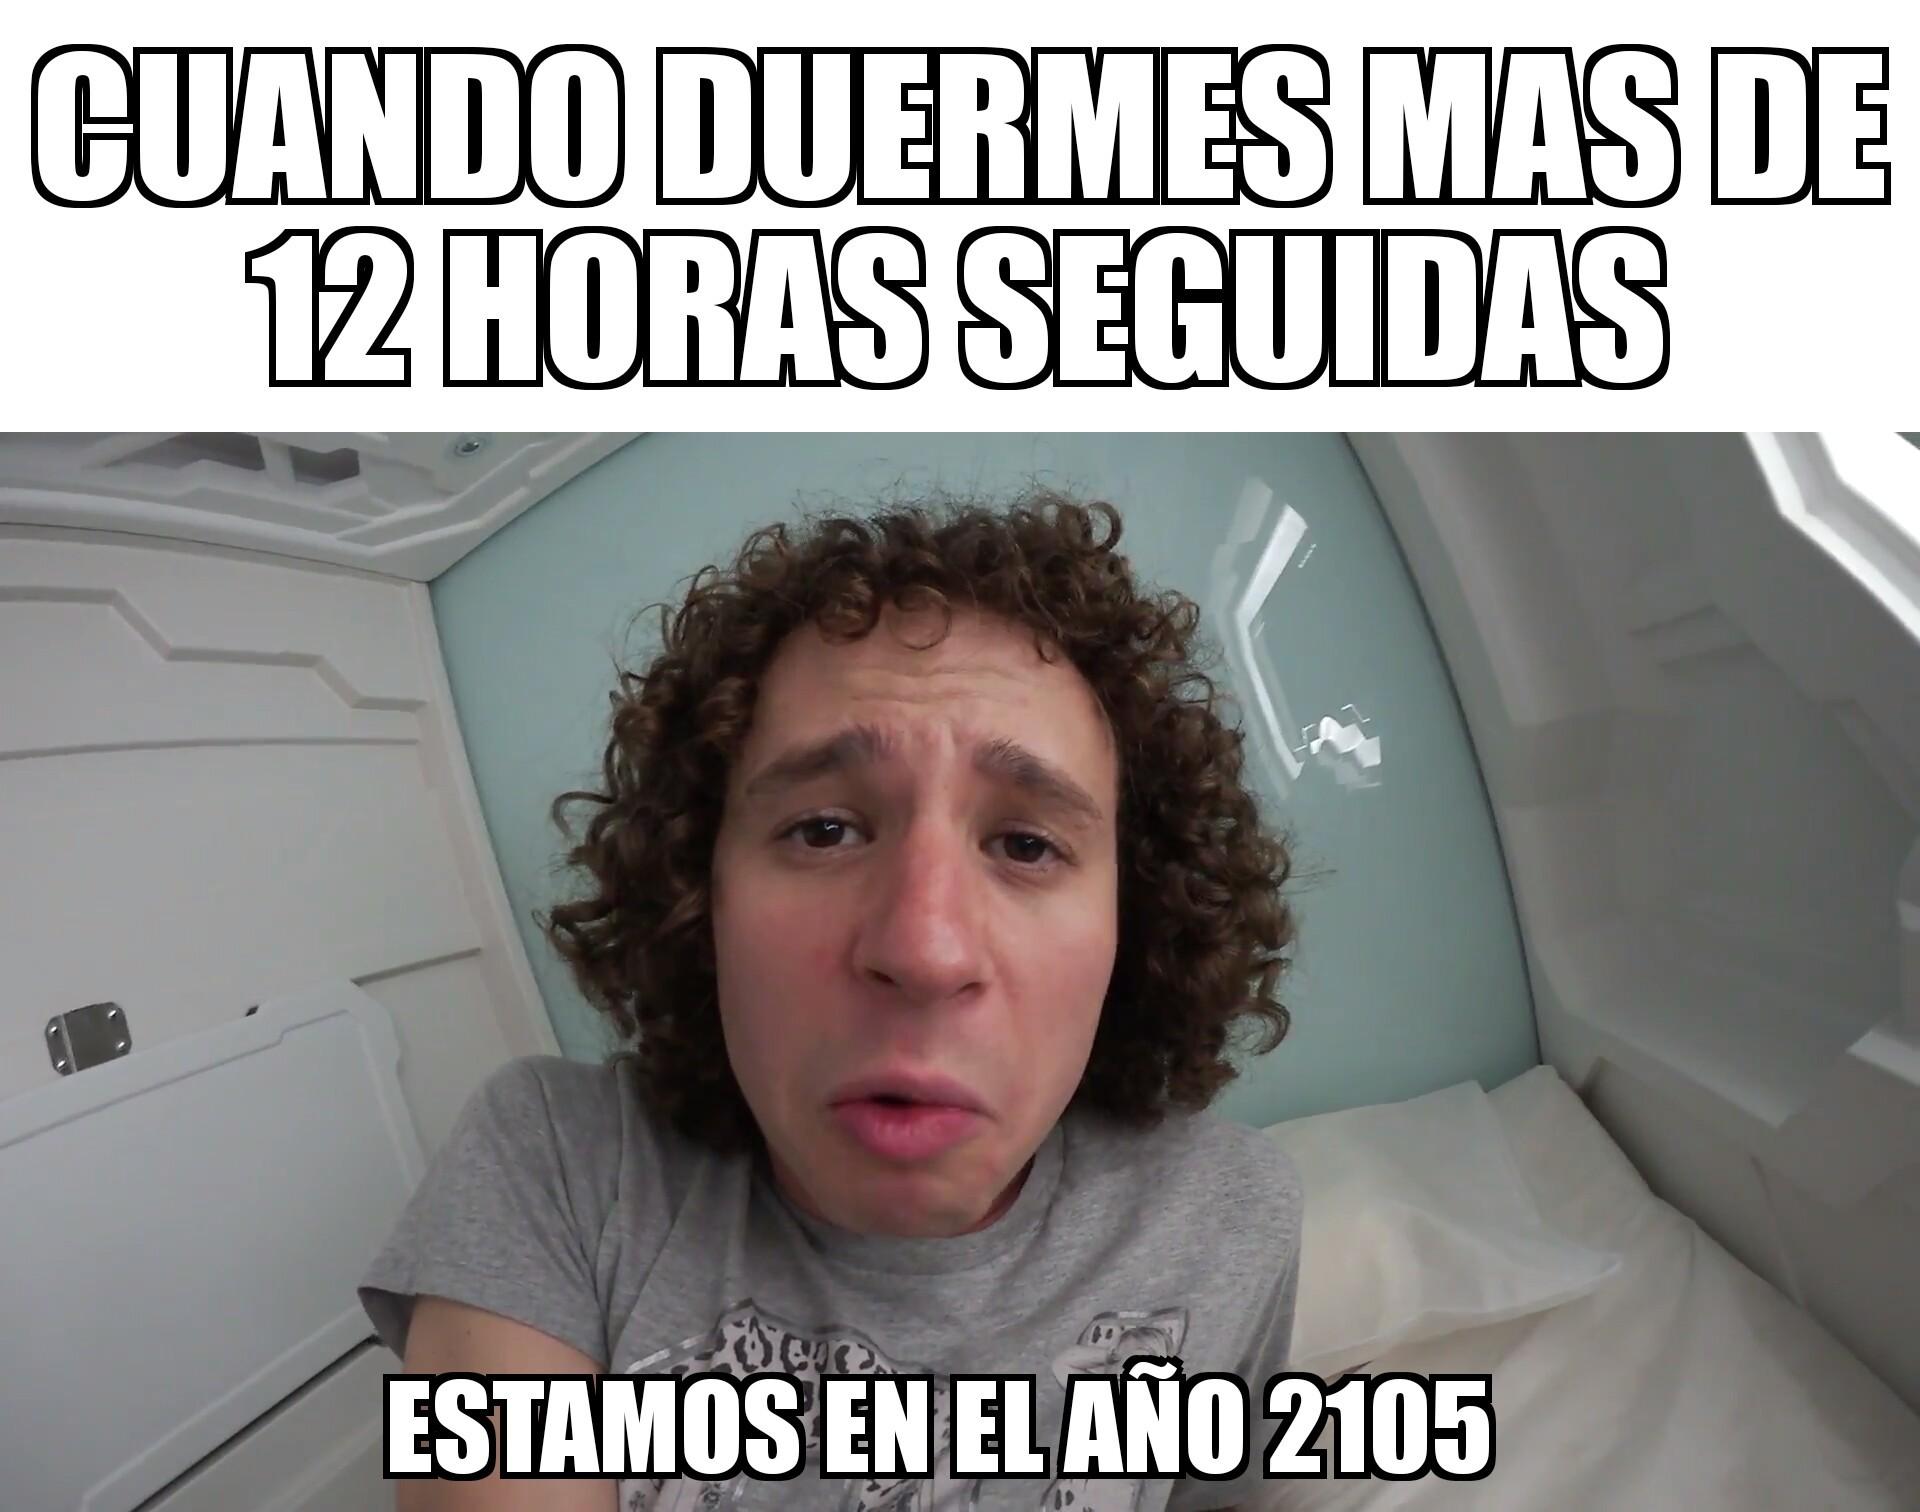 2105 - meme